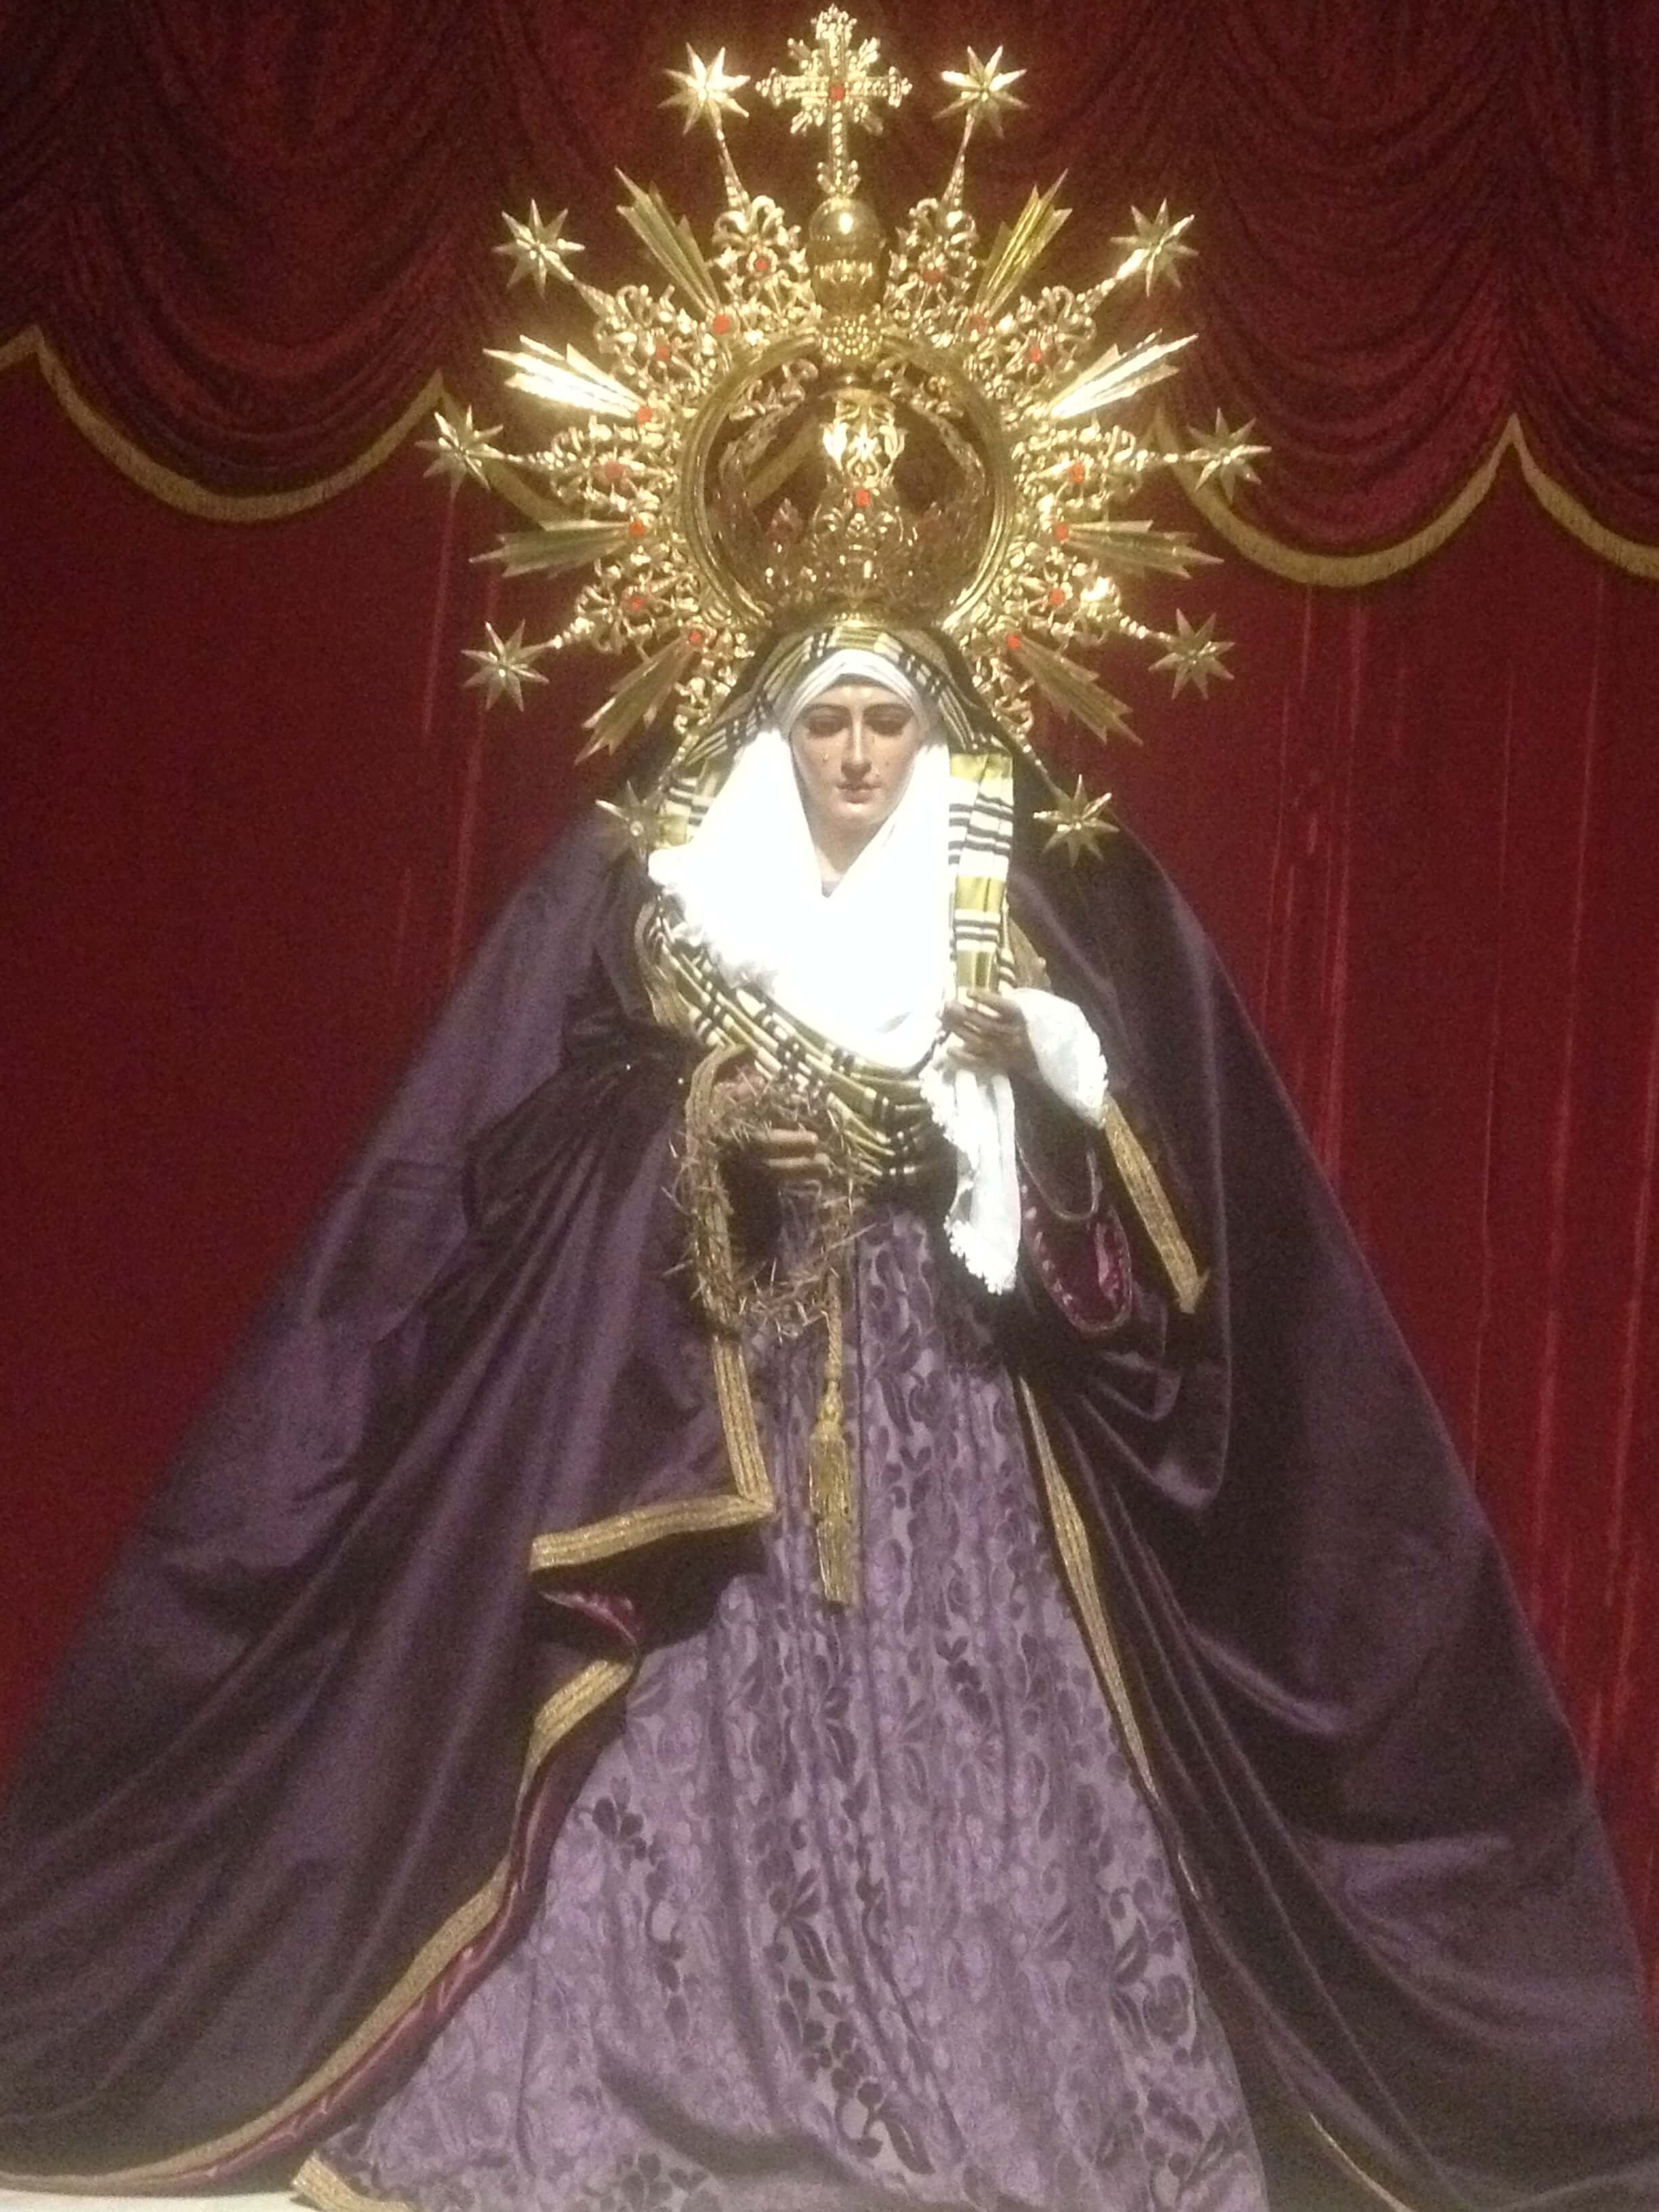 Idolâtrie mariale